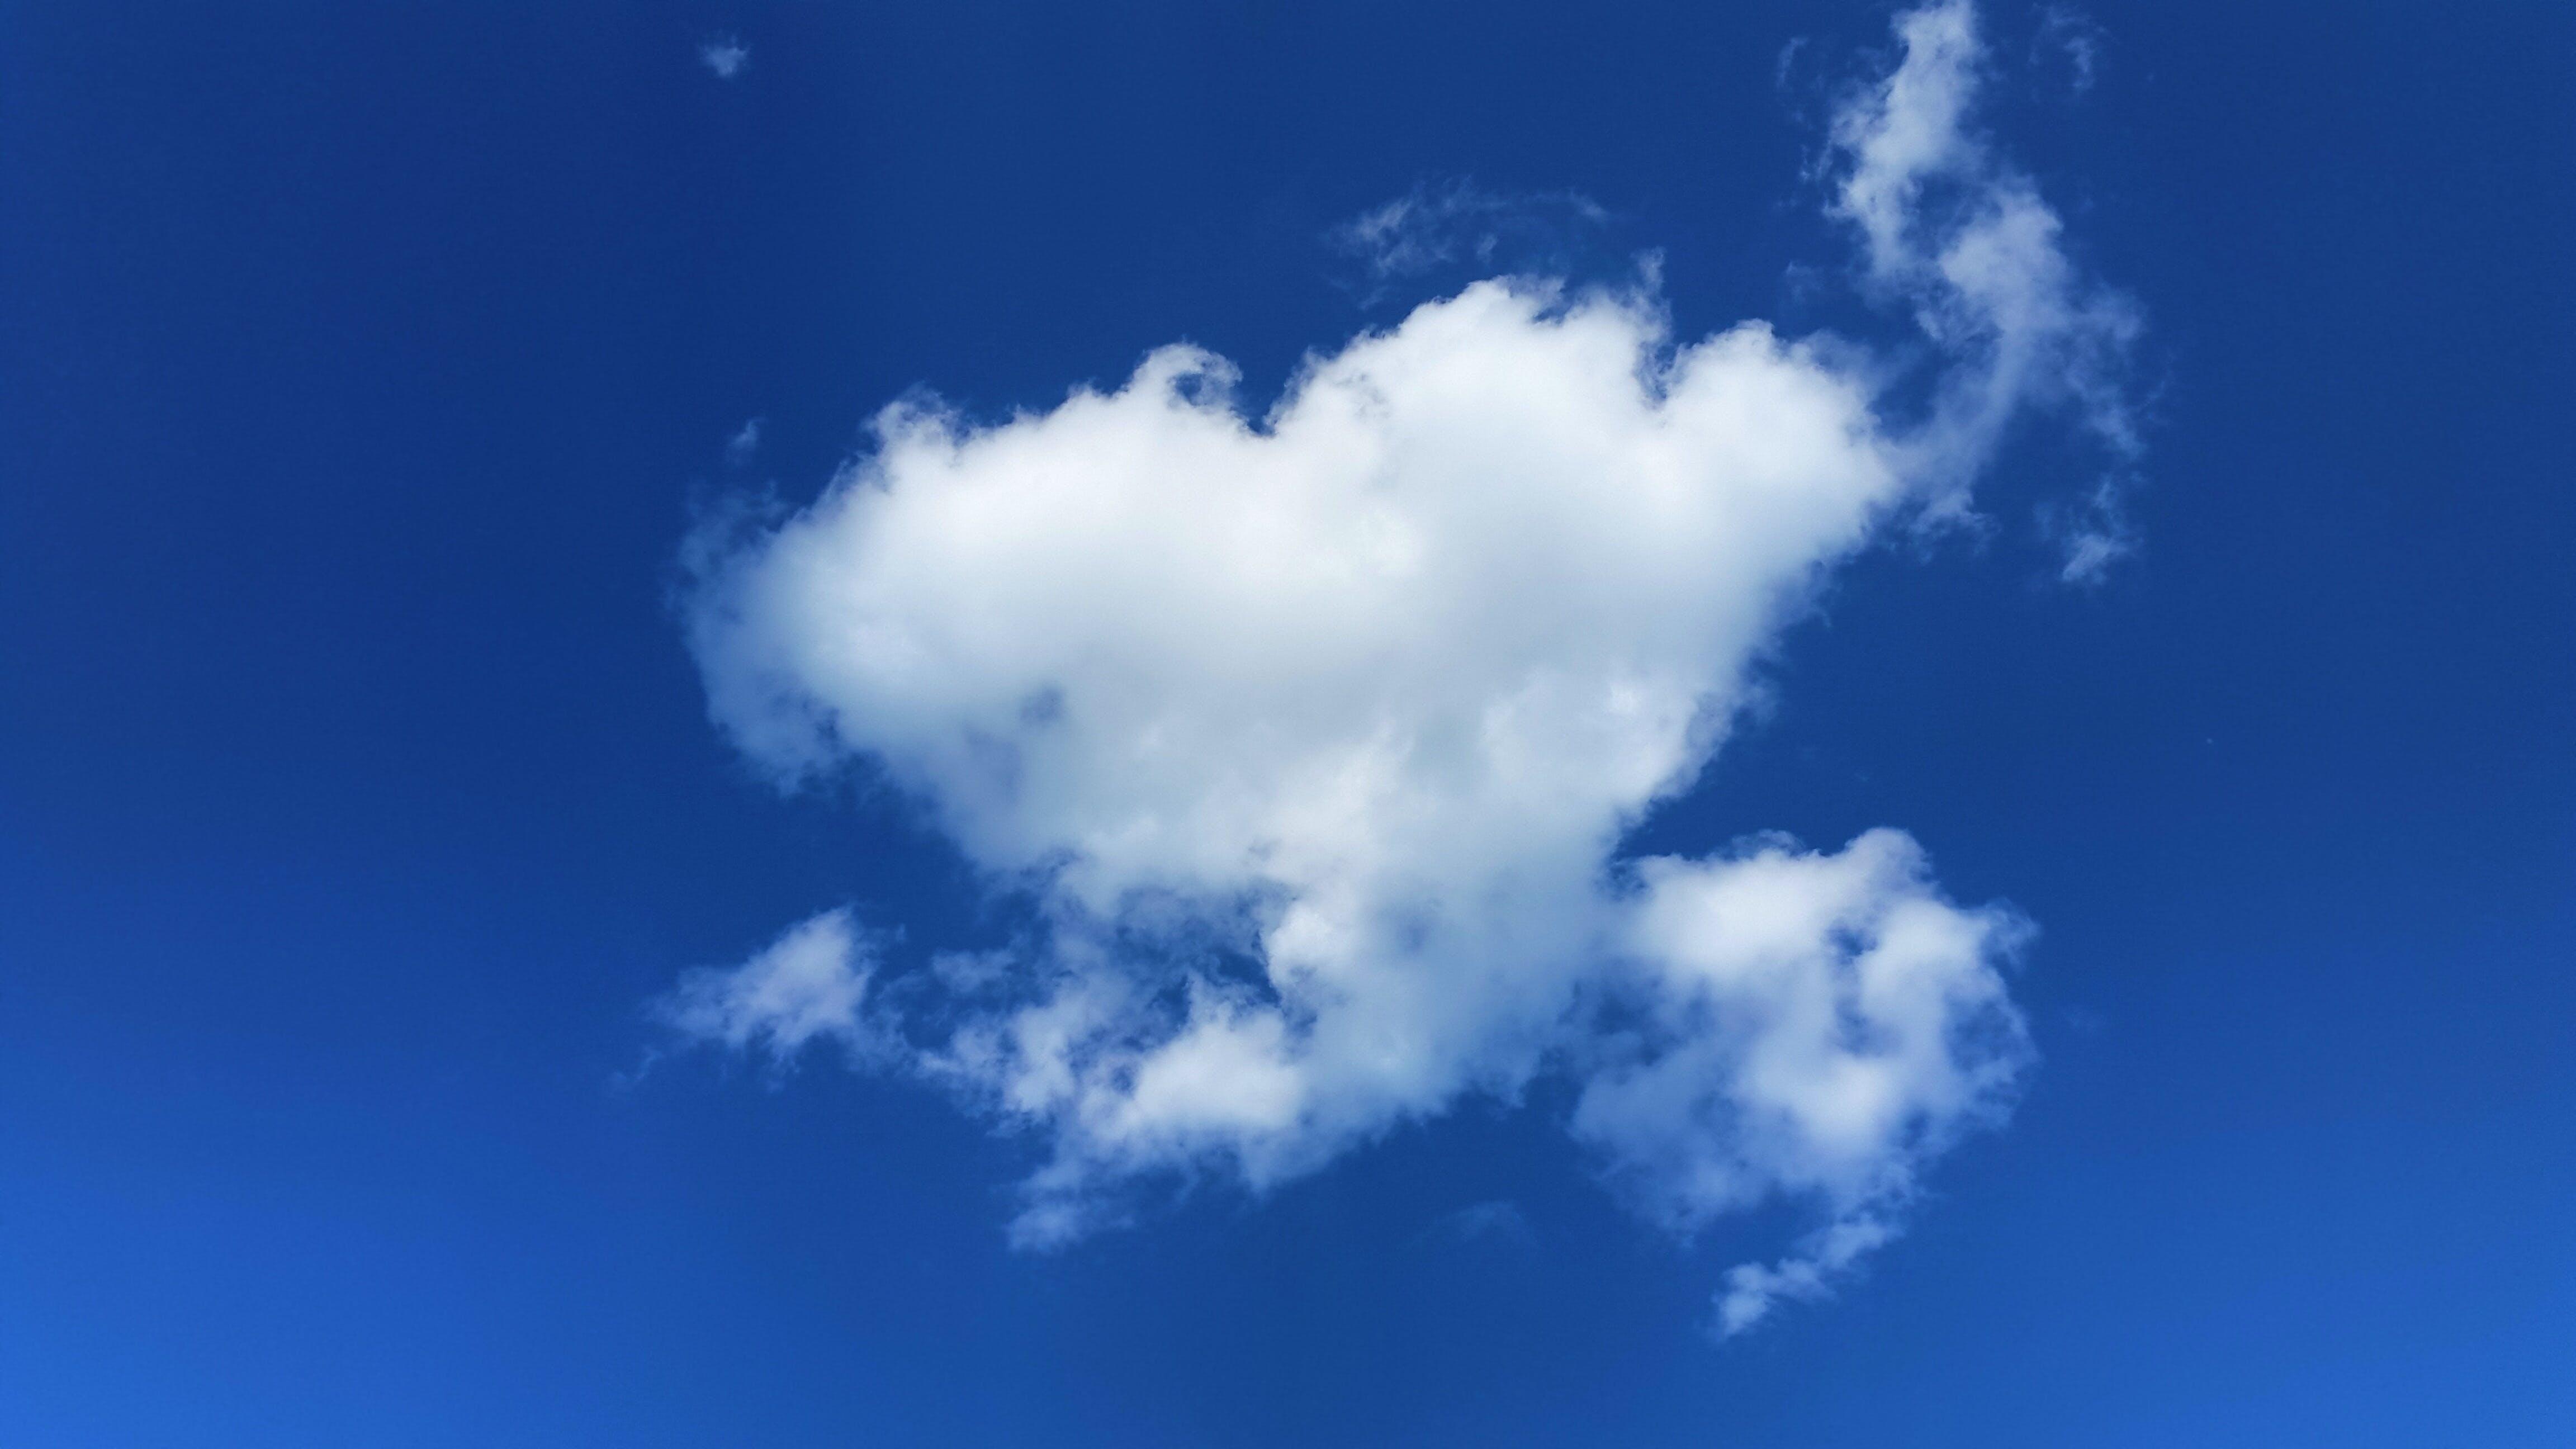 Free stock photo of nature, sky, love, heart